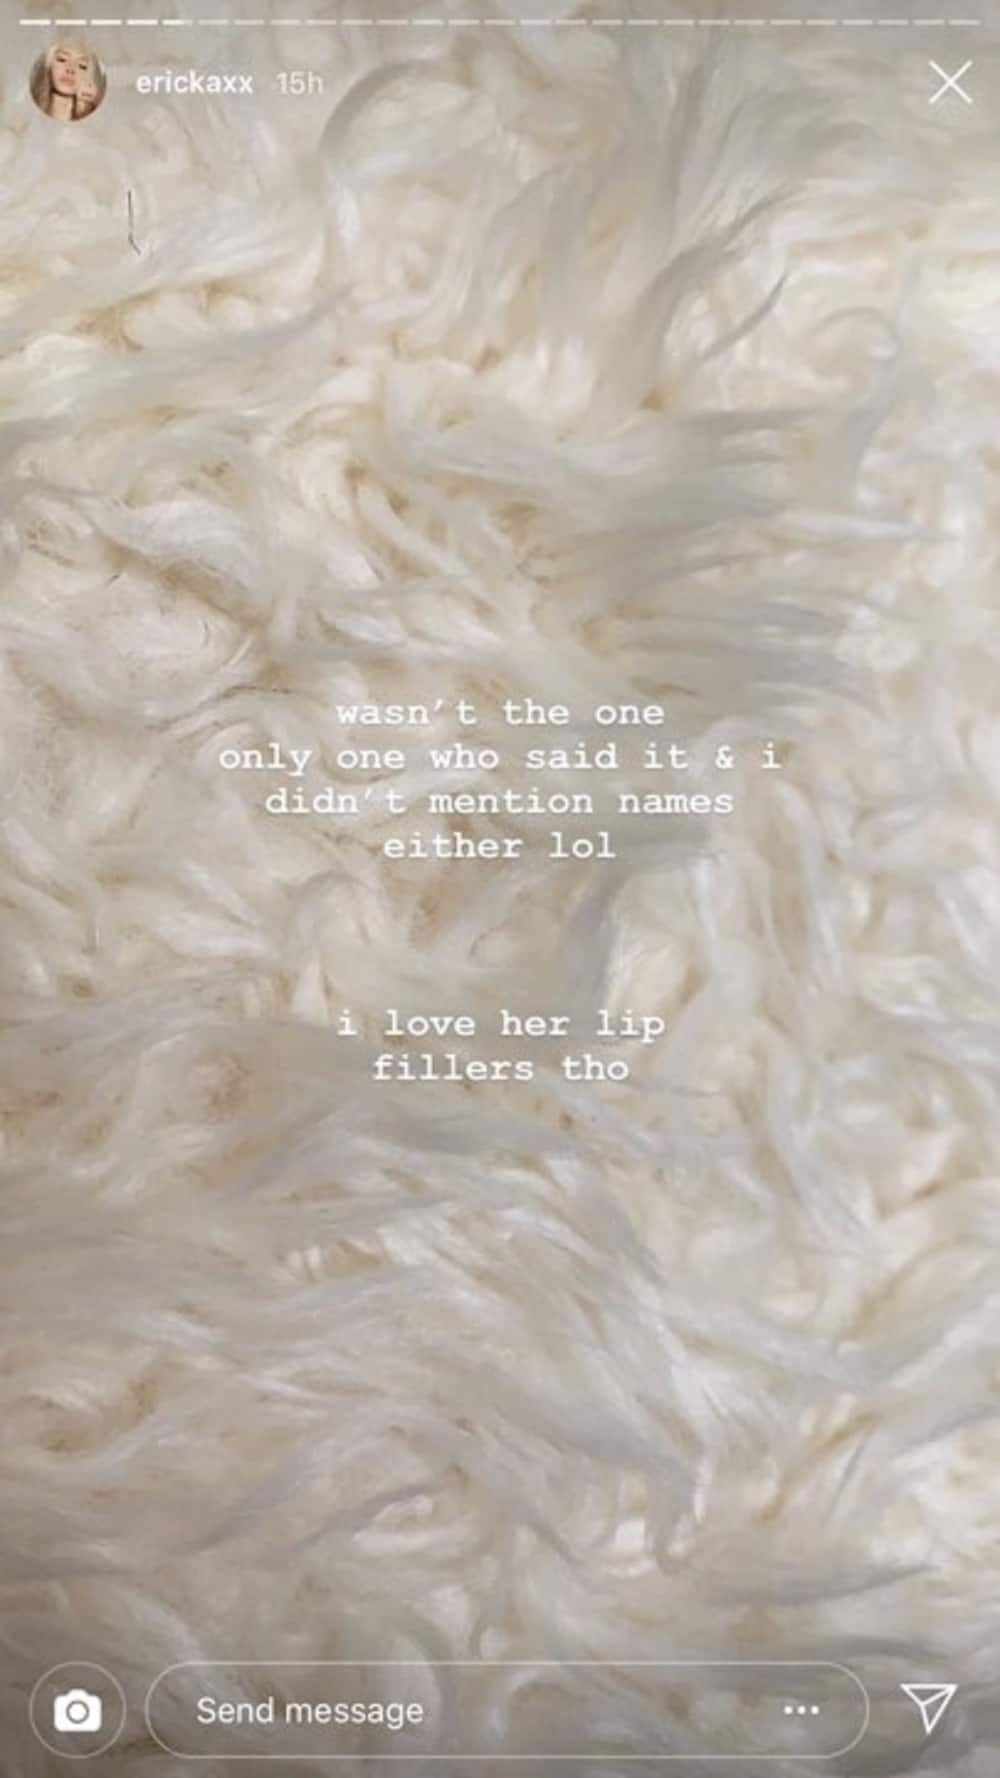 James Reid's ex-GF Ericka Villongco and Nadine Lustre's Instagram stories trigger mixed reactions